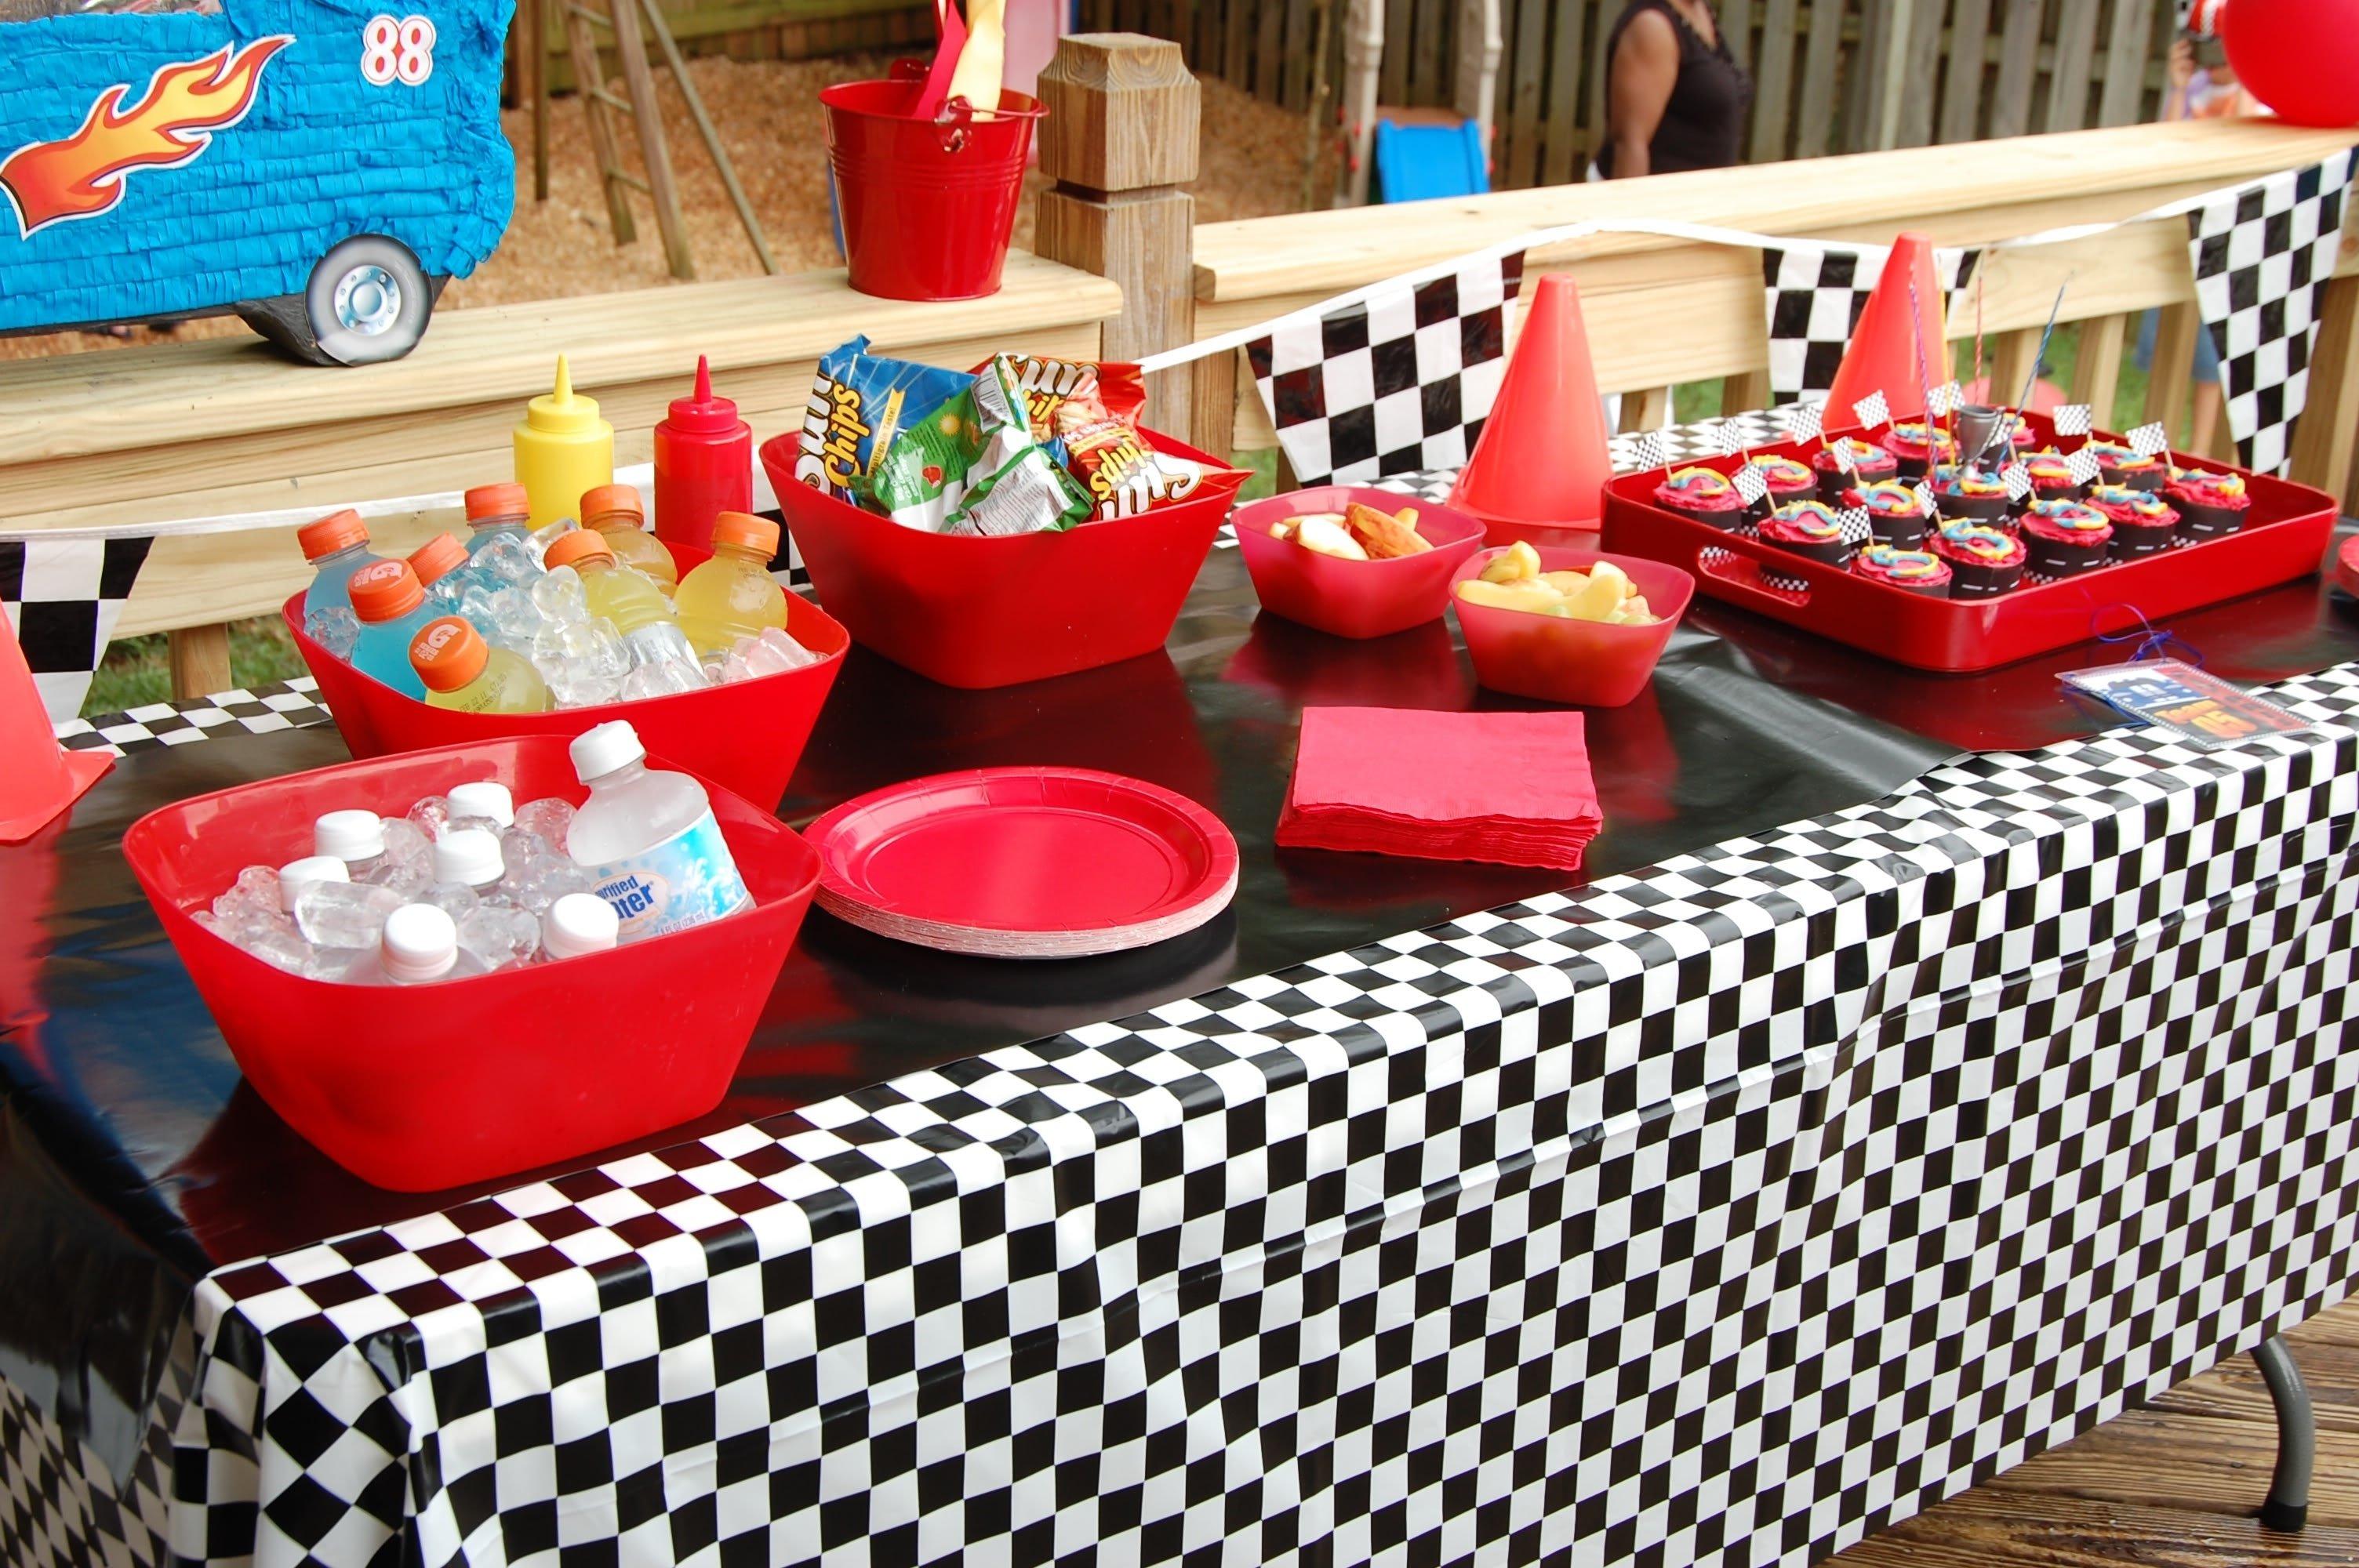 10 Stunning Race Car Birthday Party Ideas just deanna start your enginesits a race car party 2020